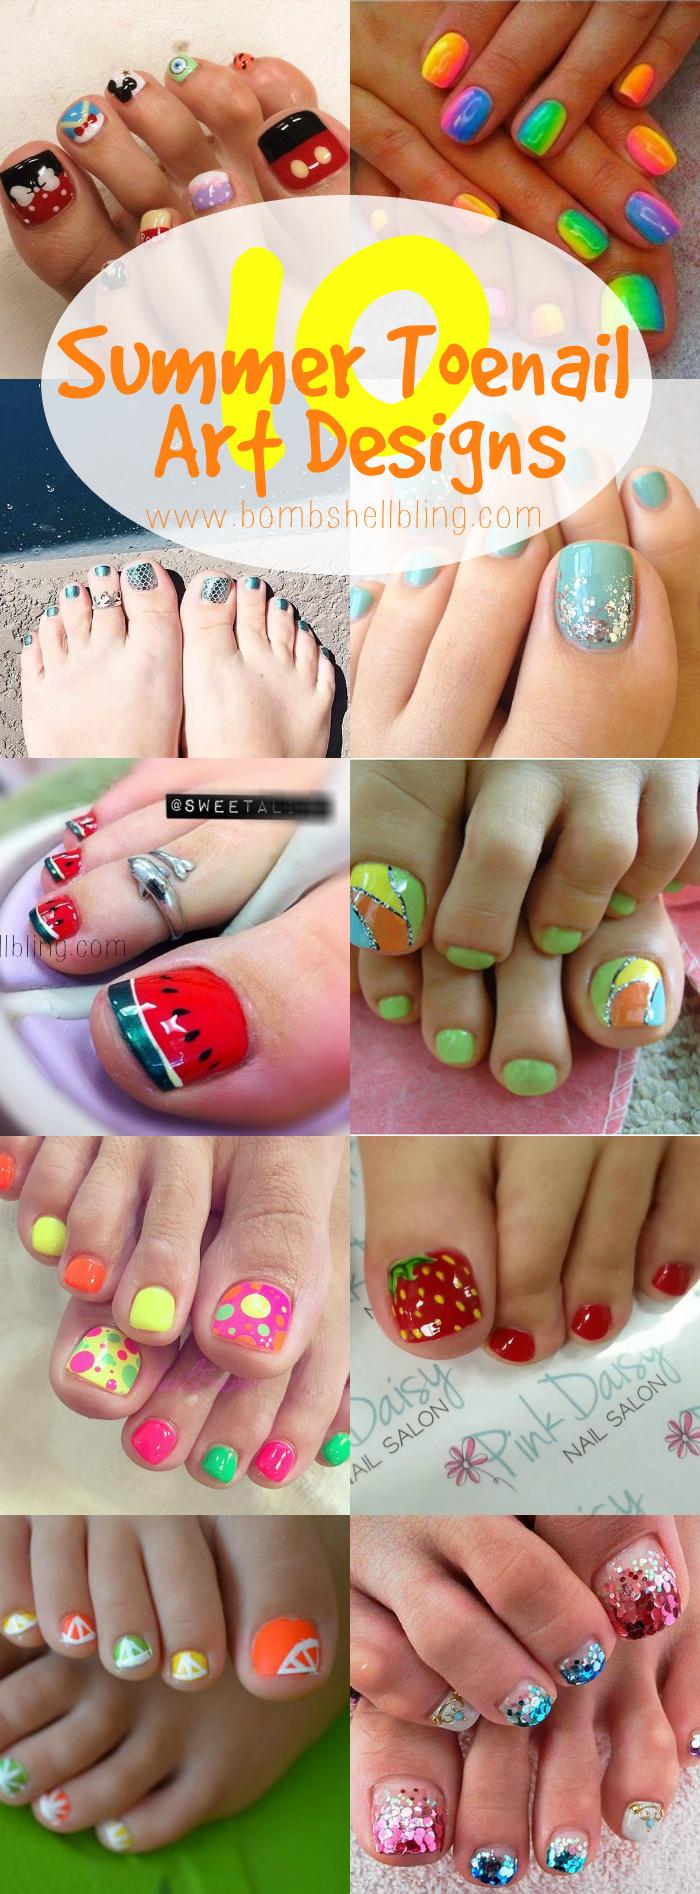 10 summer toenail art ideas 10 summer toenail art designs prinsesfo Image collections